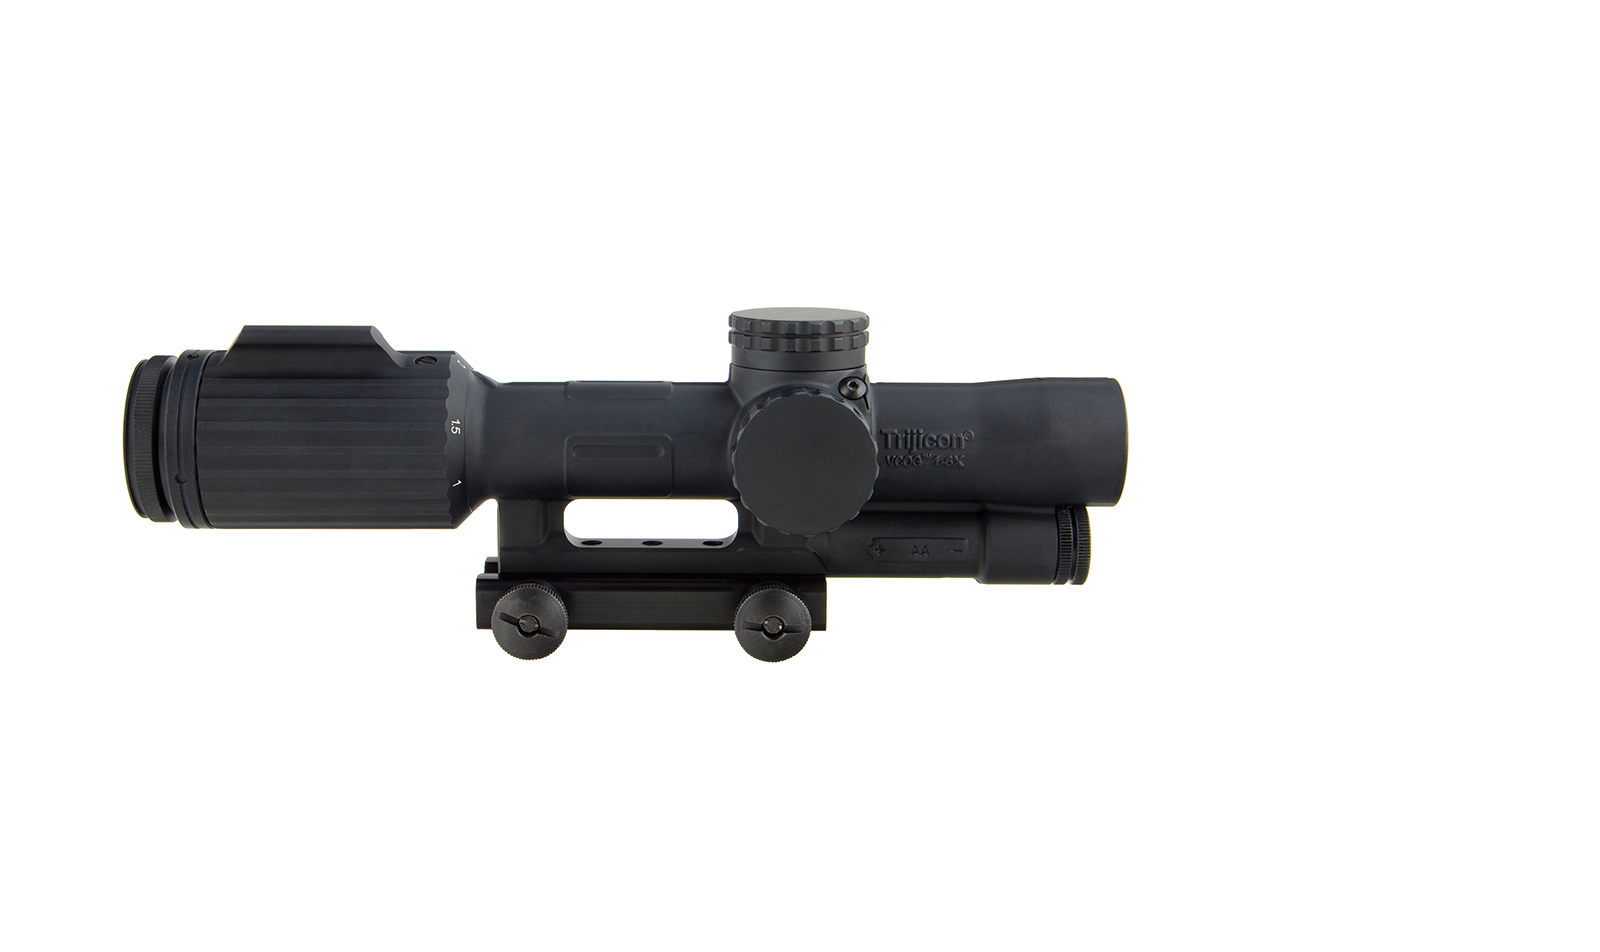 VC16-C-1600045 angle 6